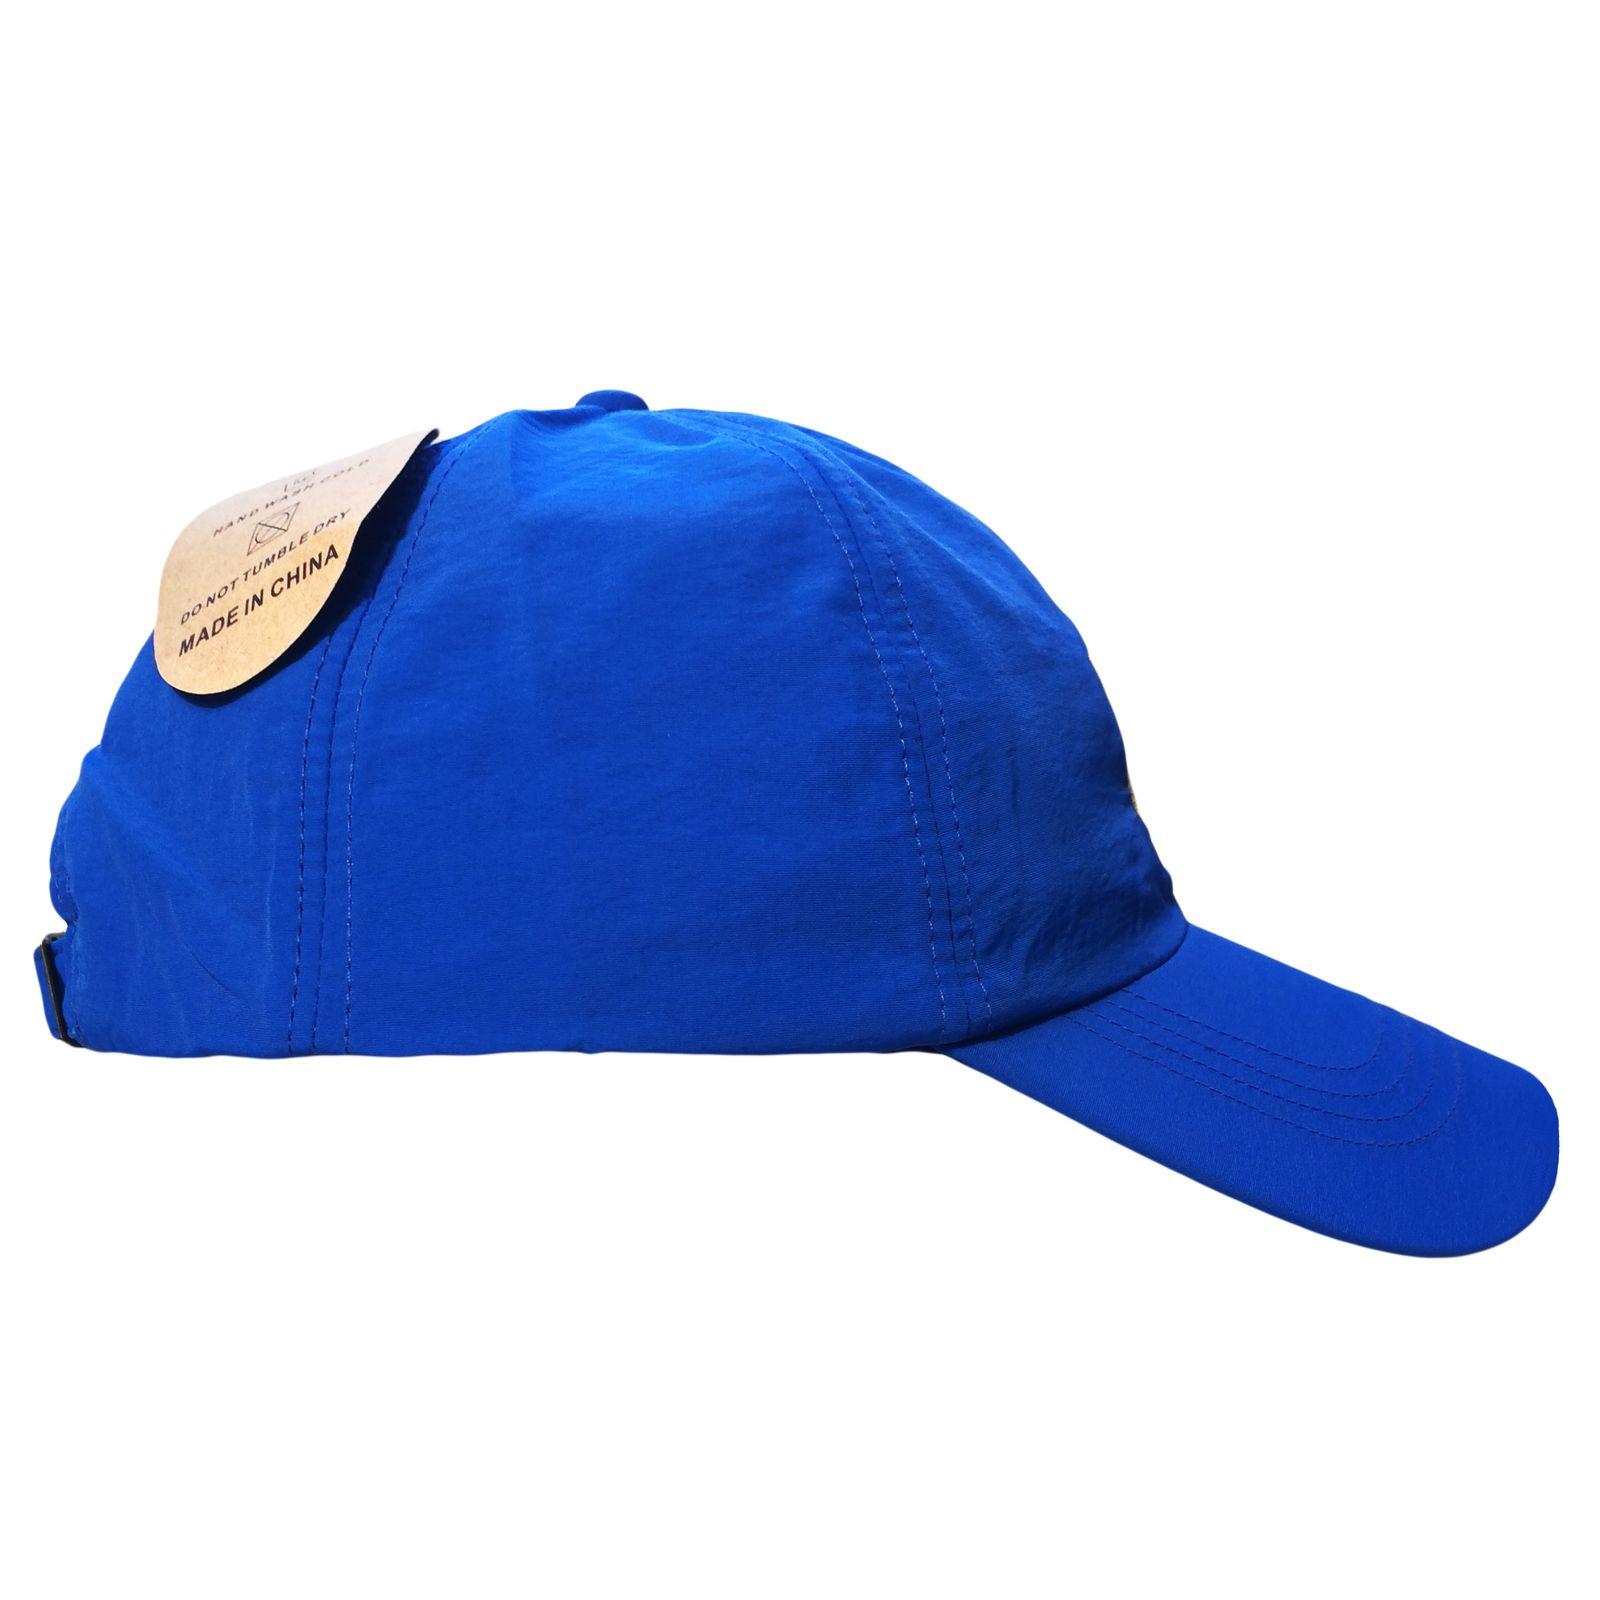 کلاه کپ طرح بارسلونا کد H-31 -  - 4